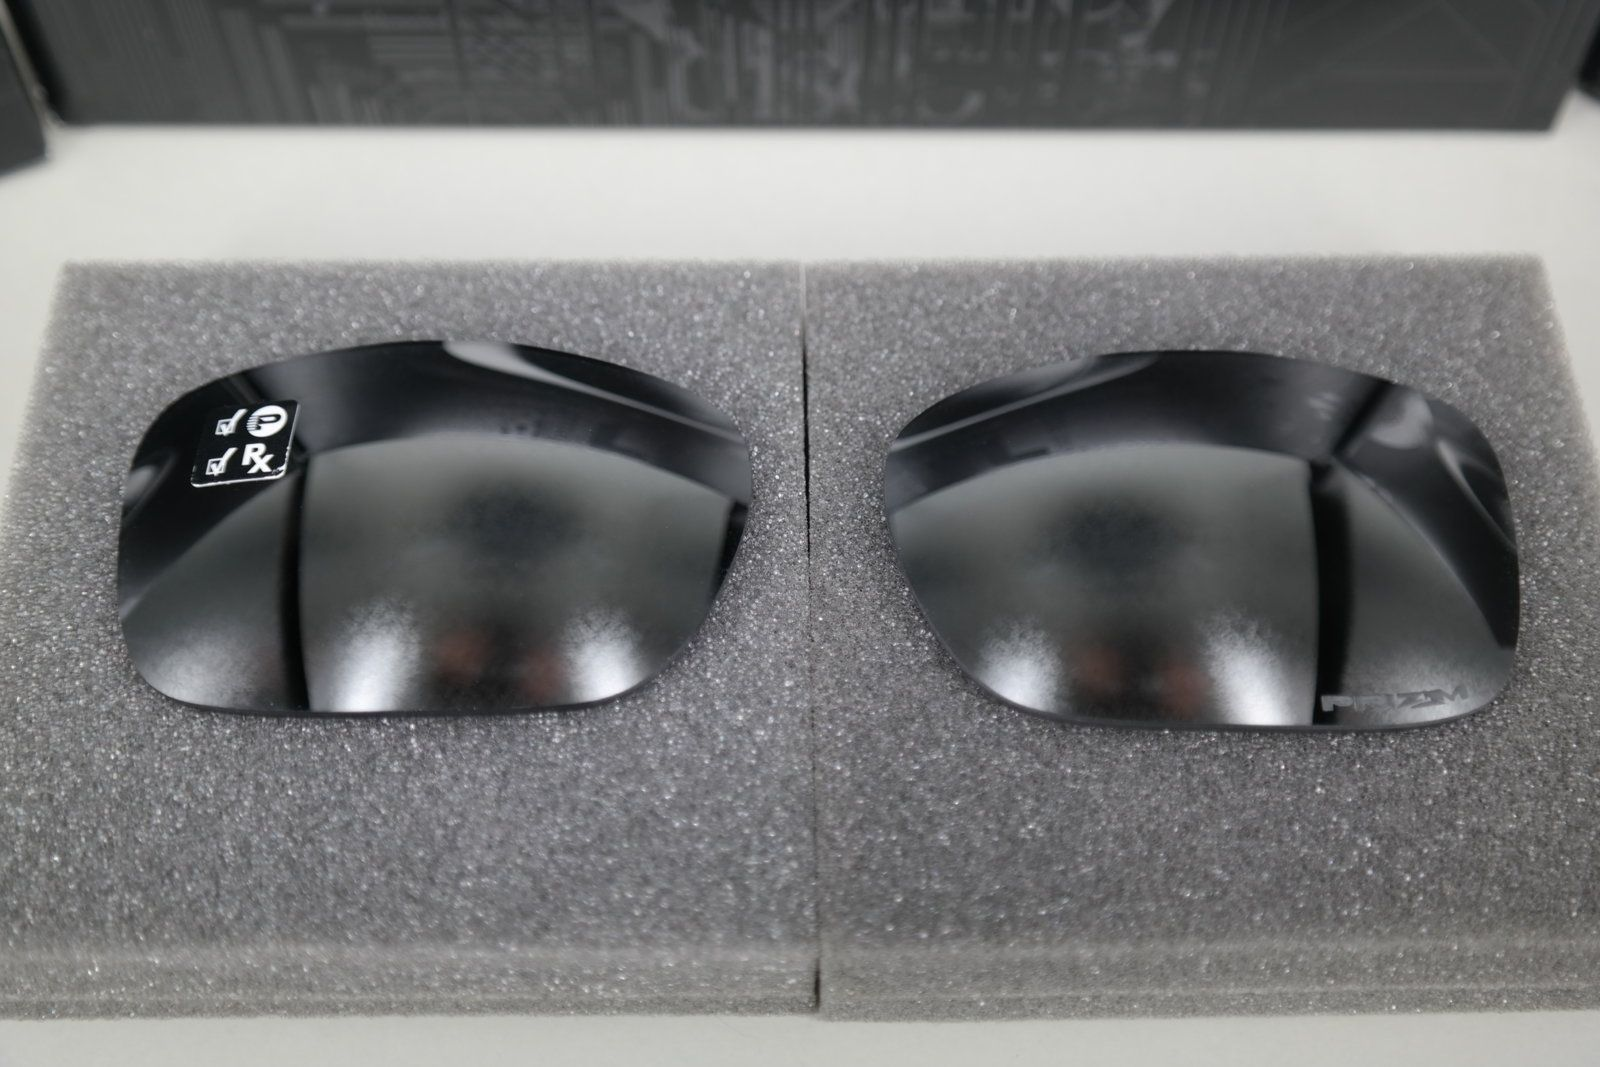 Low price authentic lenses for sale (Crosshair, Conductor, Gauge, Holbrook metal, Tincan, Twoface..) - SAM_3170.JPG